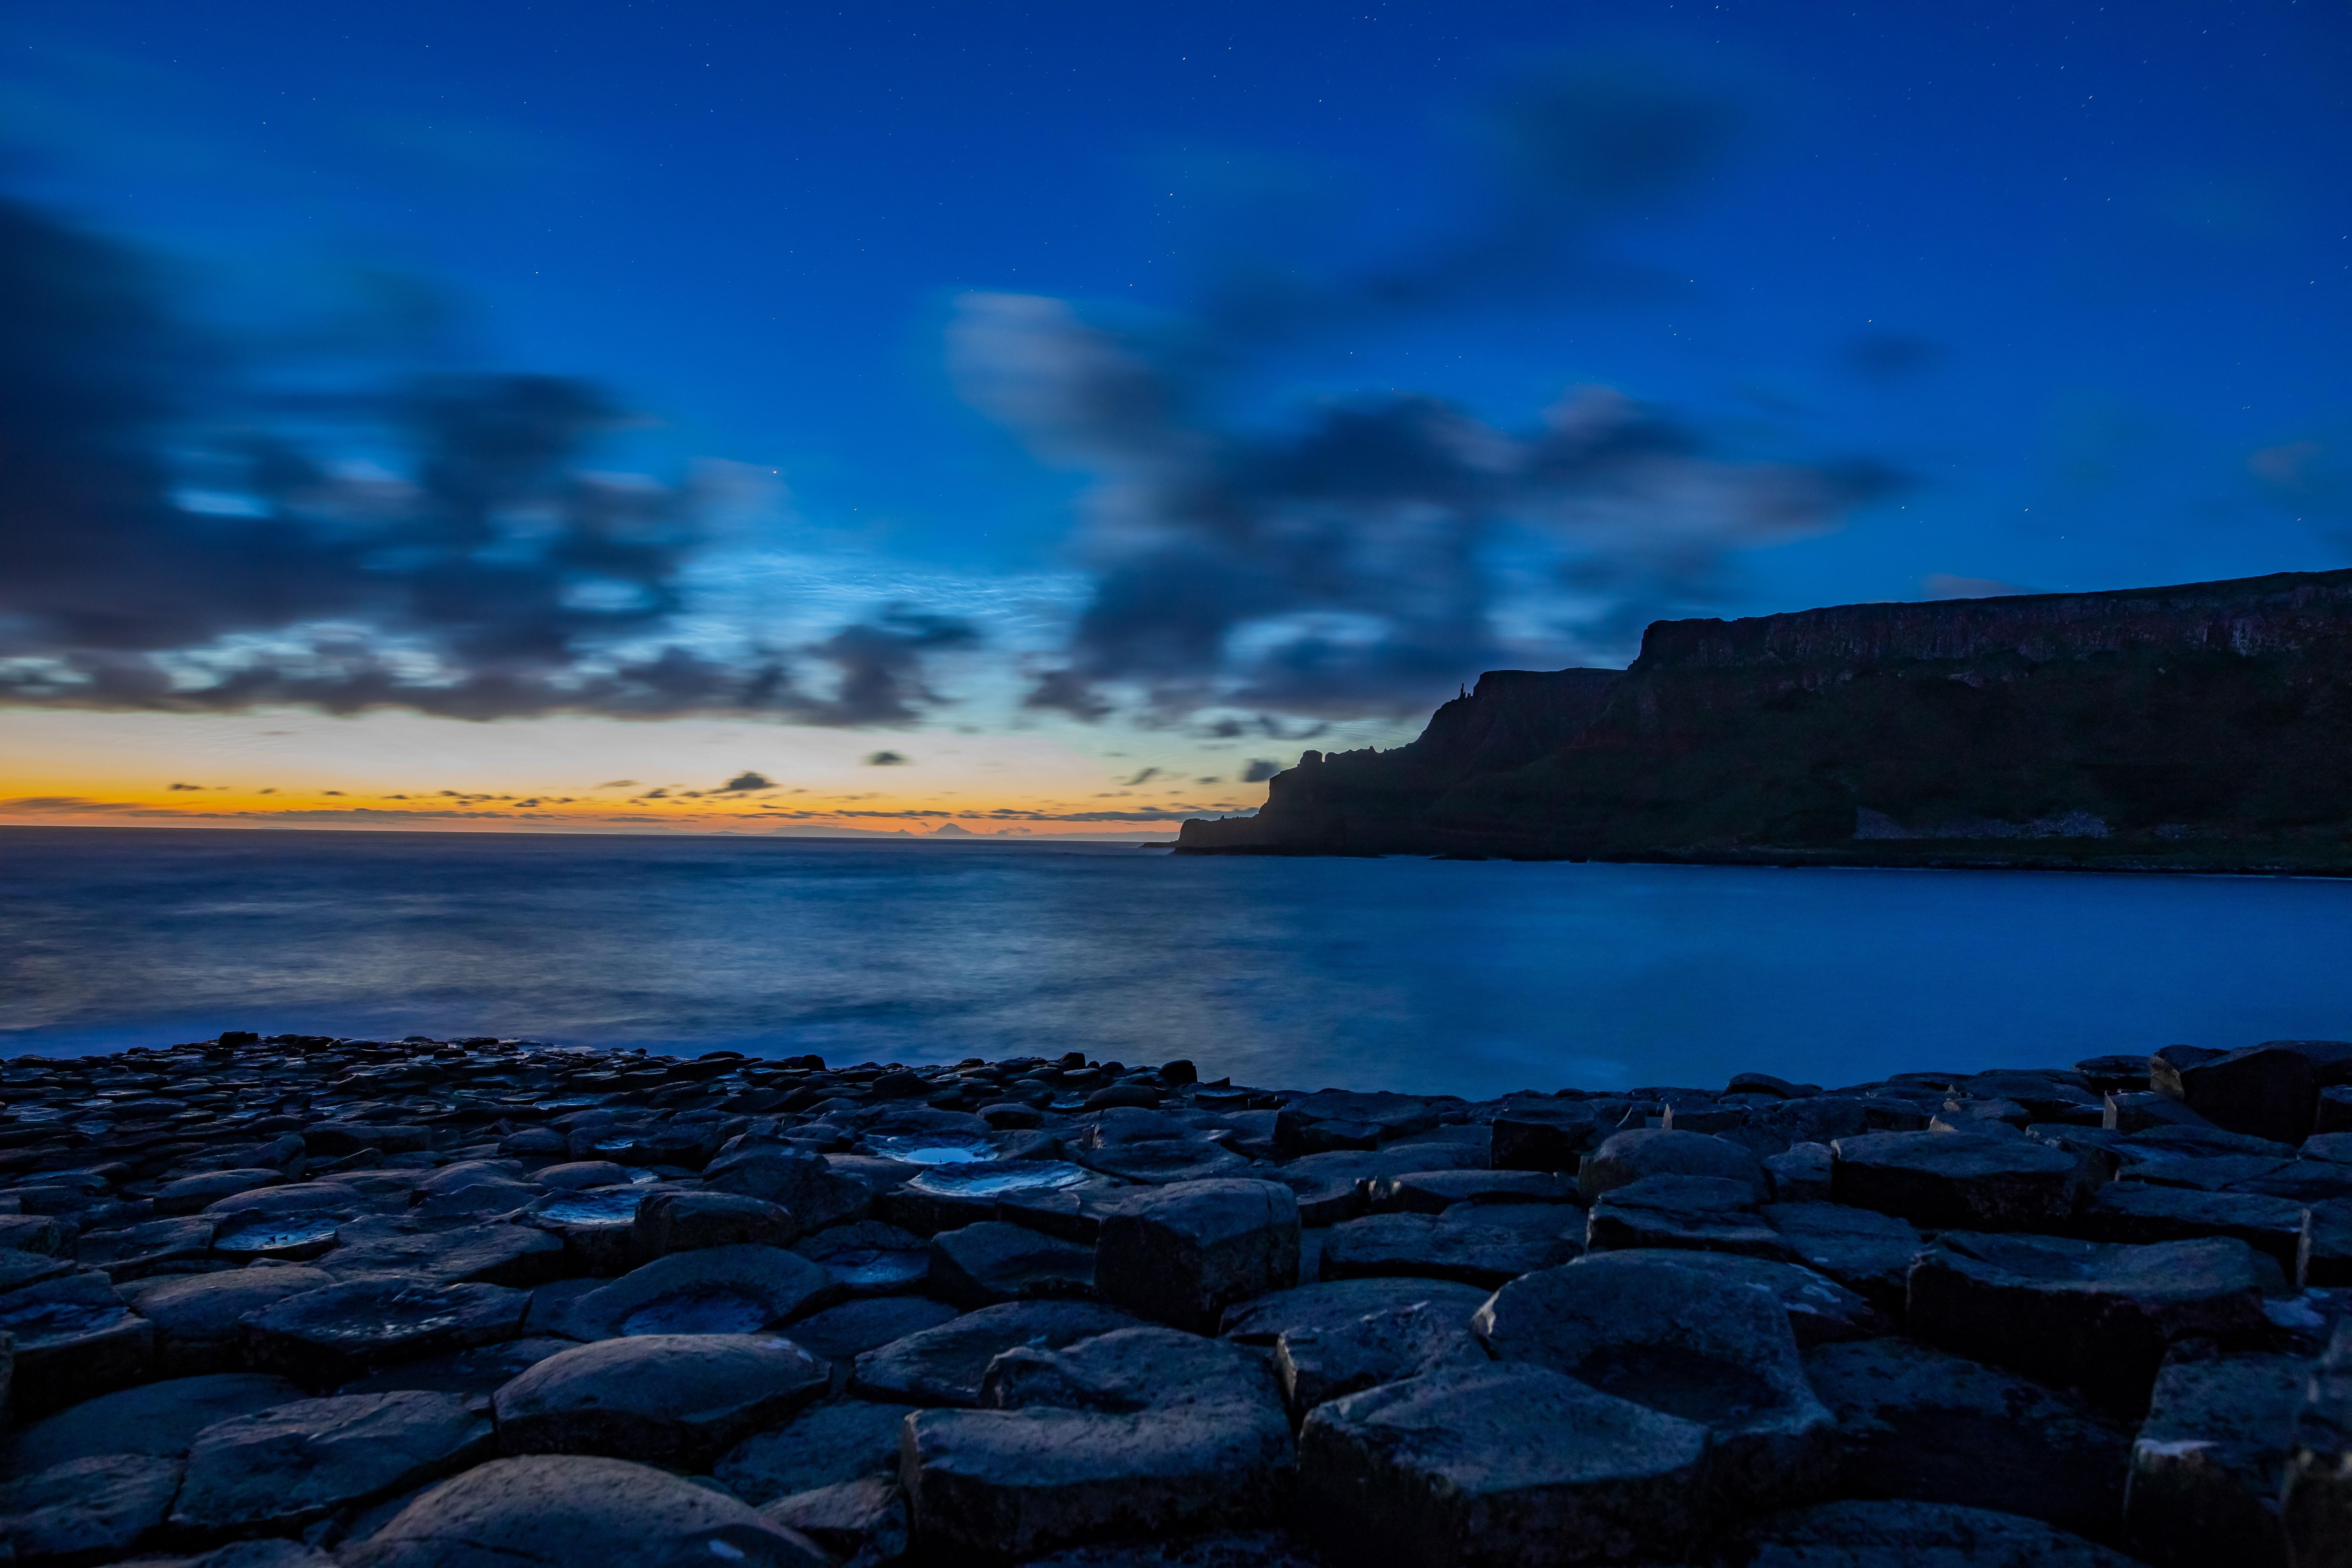 landscape photography of Giant's Causeway, Ireland